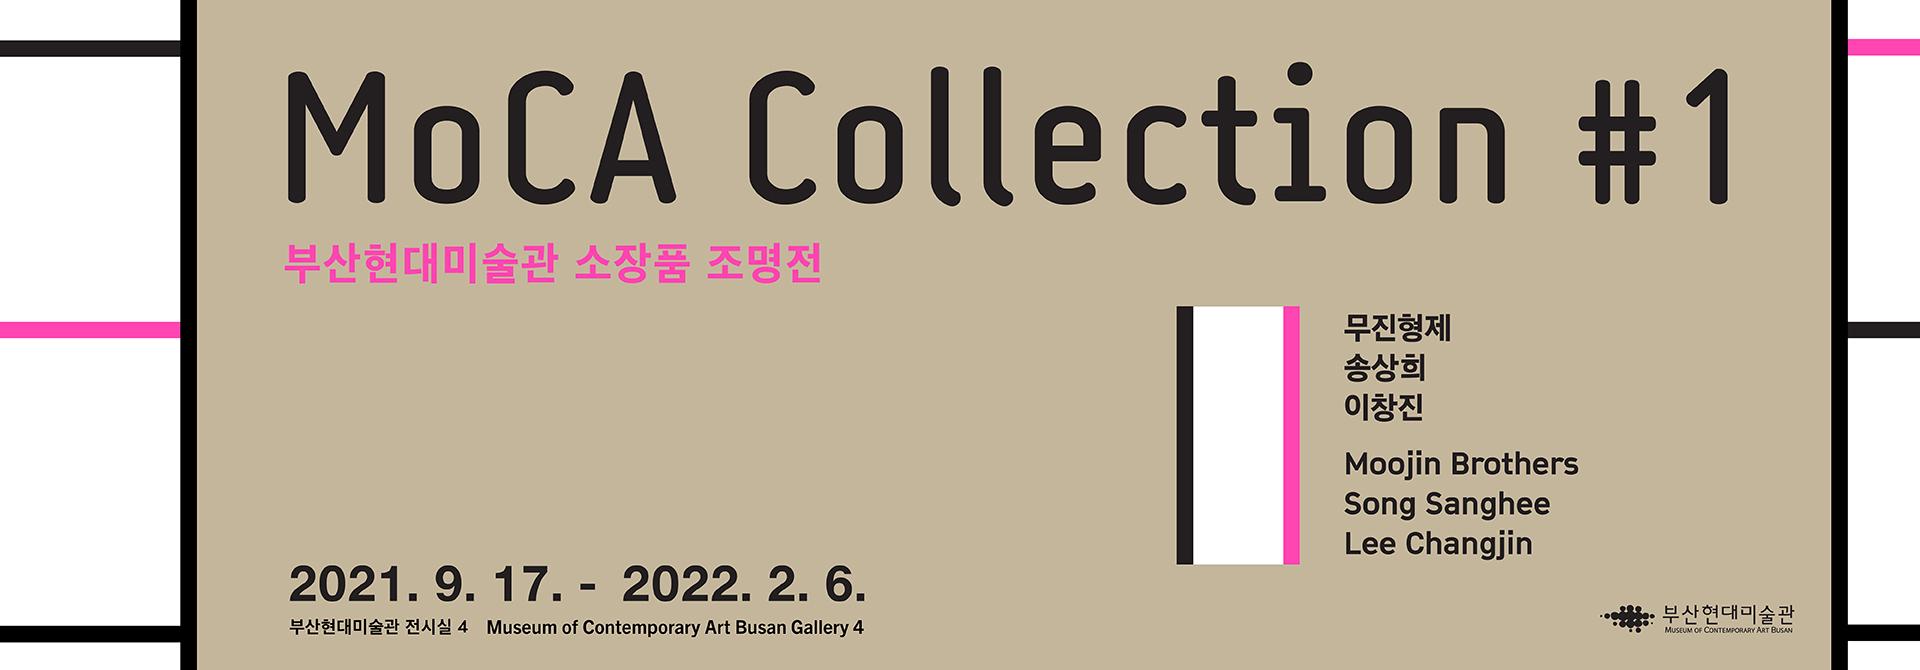 MoCA Collection #1 부산현대미술관 소장품 조명전 2021.9.17. - 2022.2.6. 부산현대미술관 전시실4 Museum of Contemporary Art Busan Gallery 4 무진형제 송상희 이창진 Moojin Brothers Song Sanghee Lee Changjin 부산현대미술관